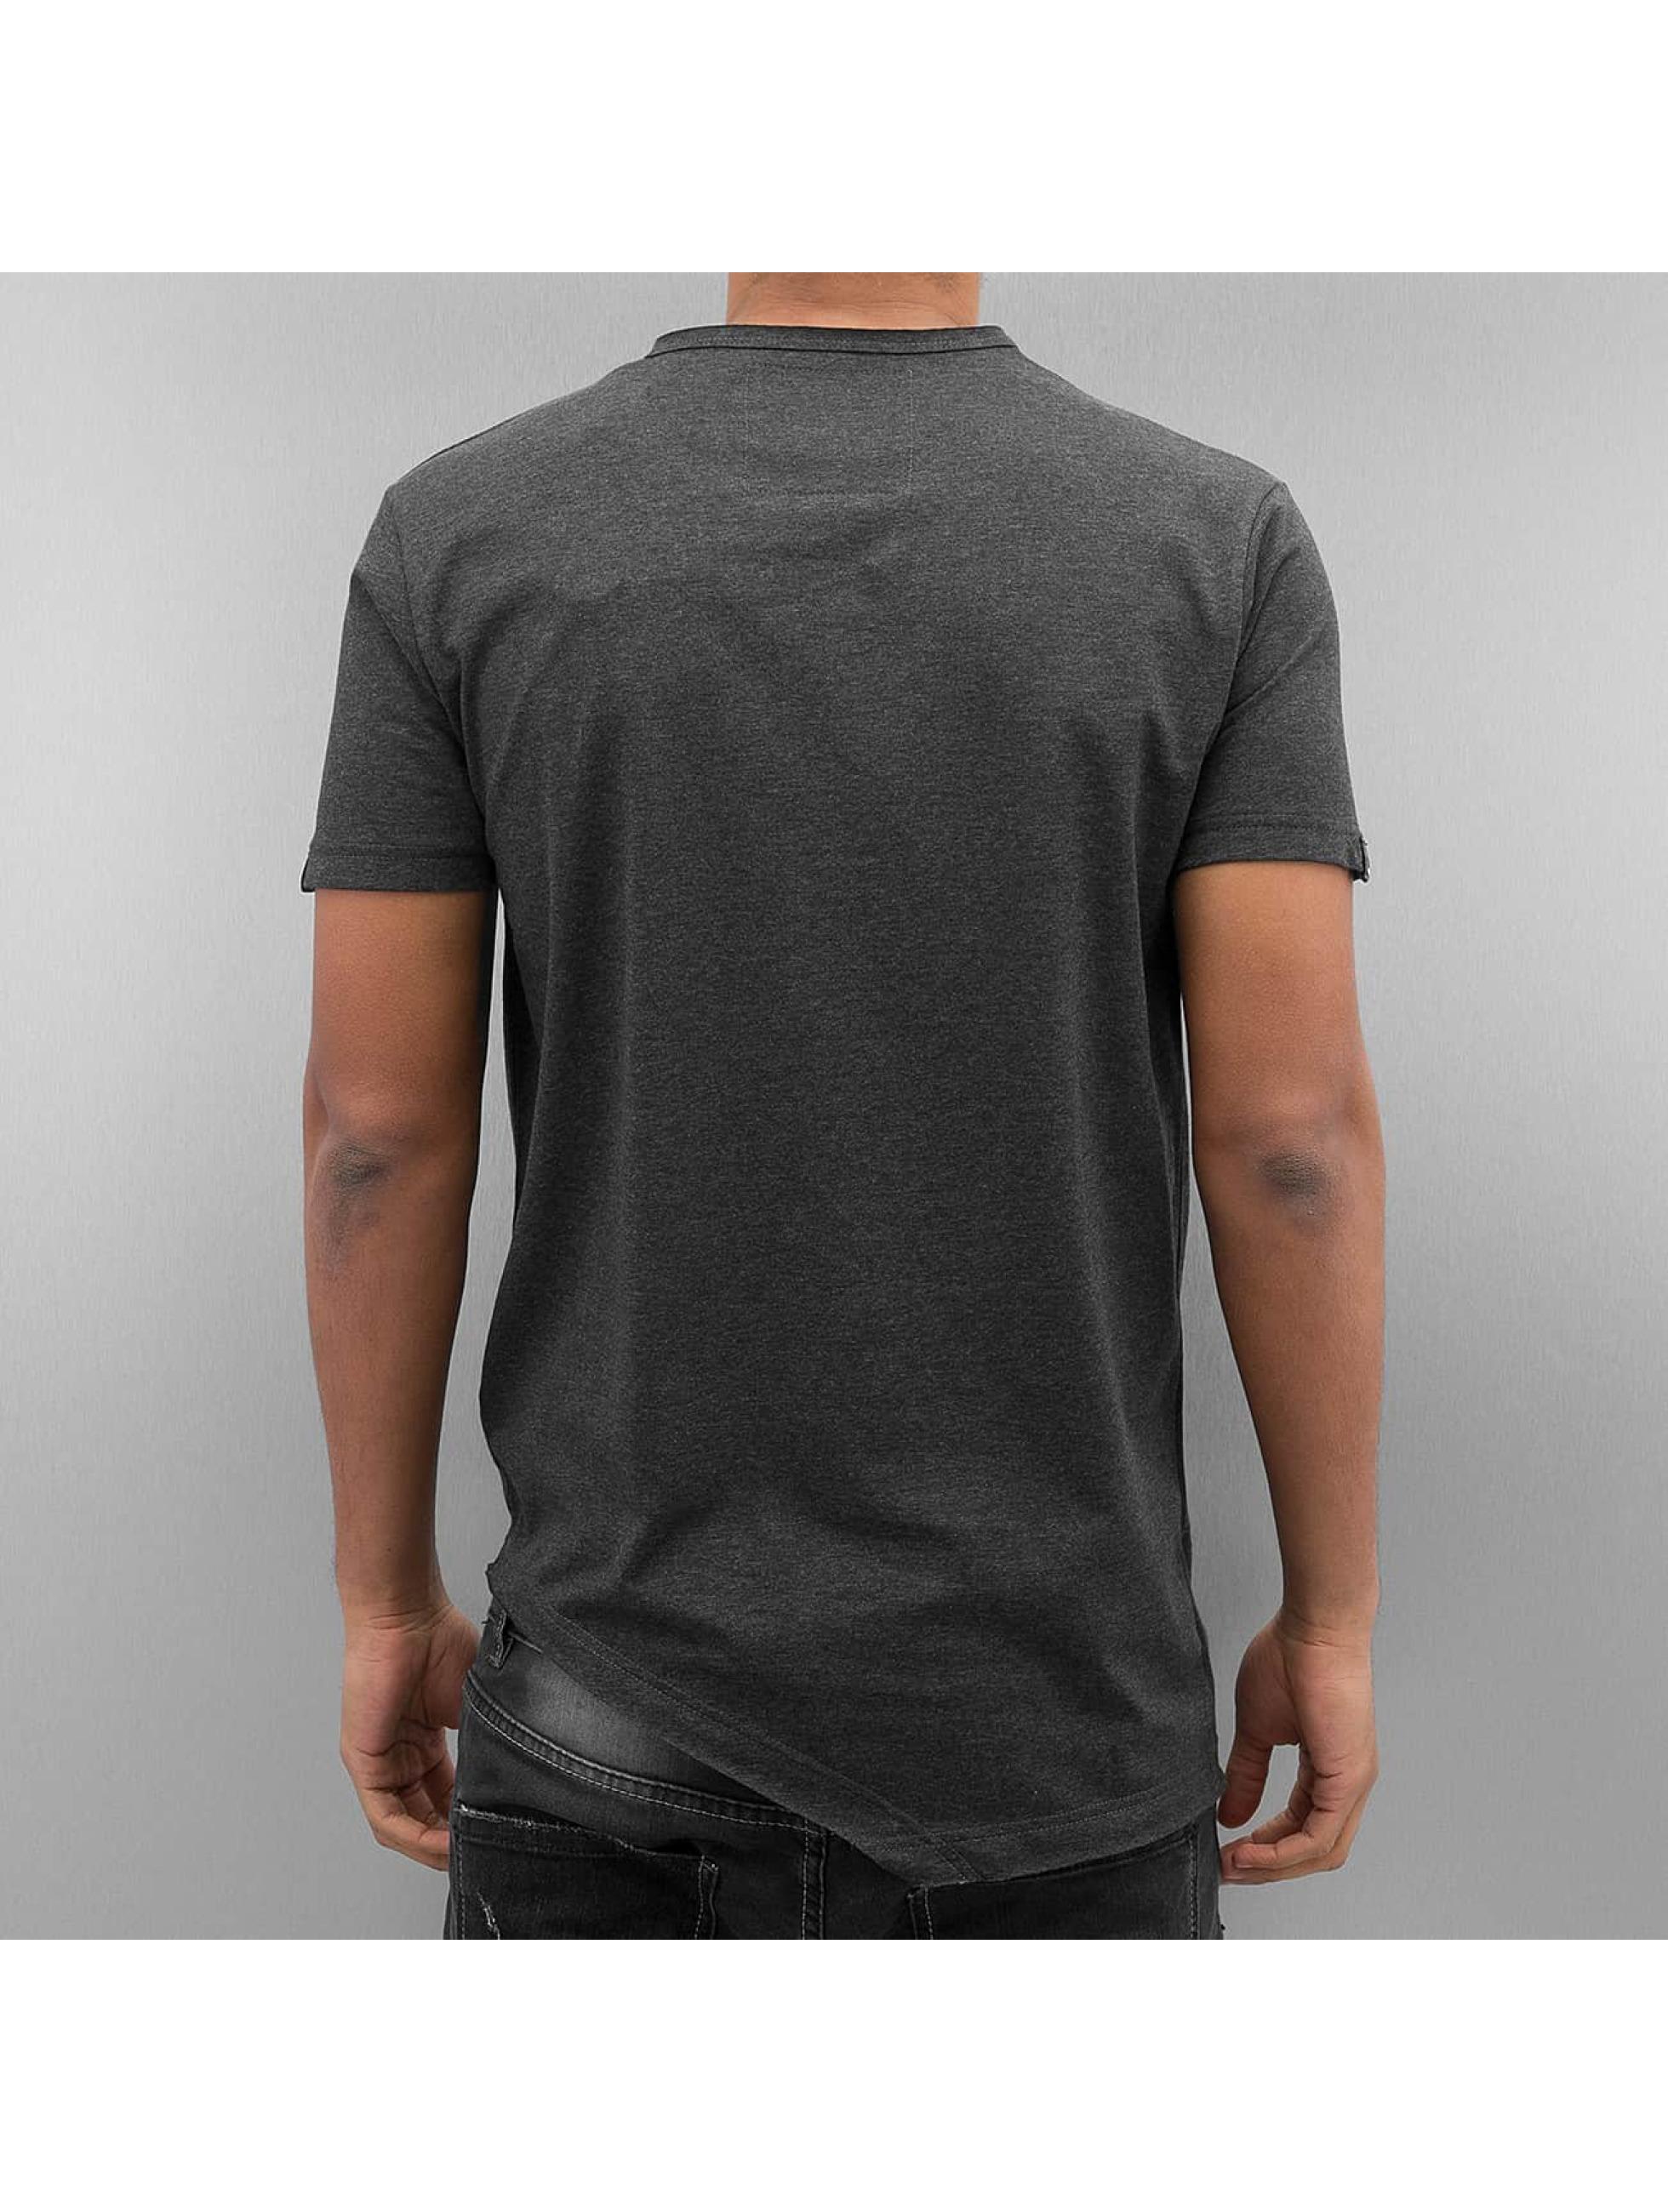 Cipo & Baxx T-Shirt Warwick grau